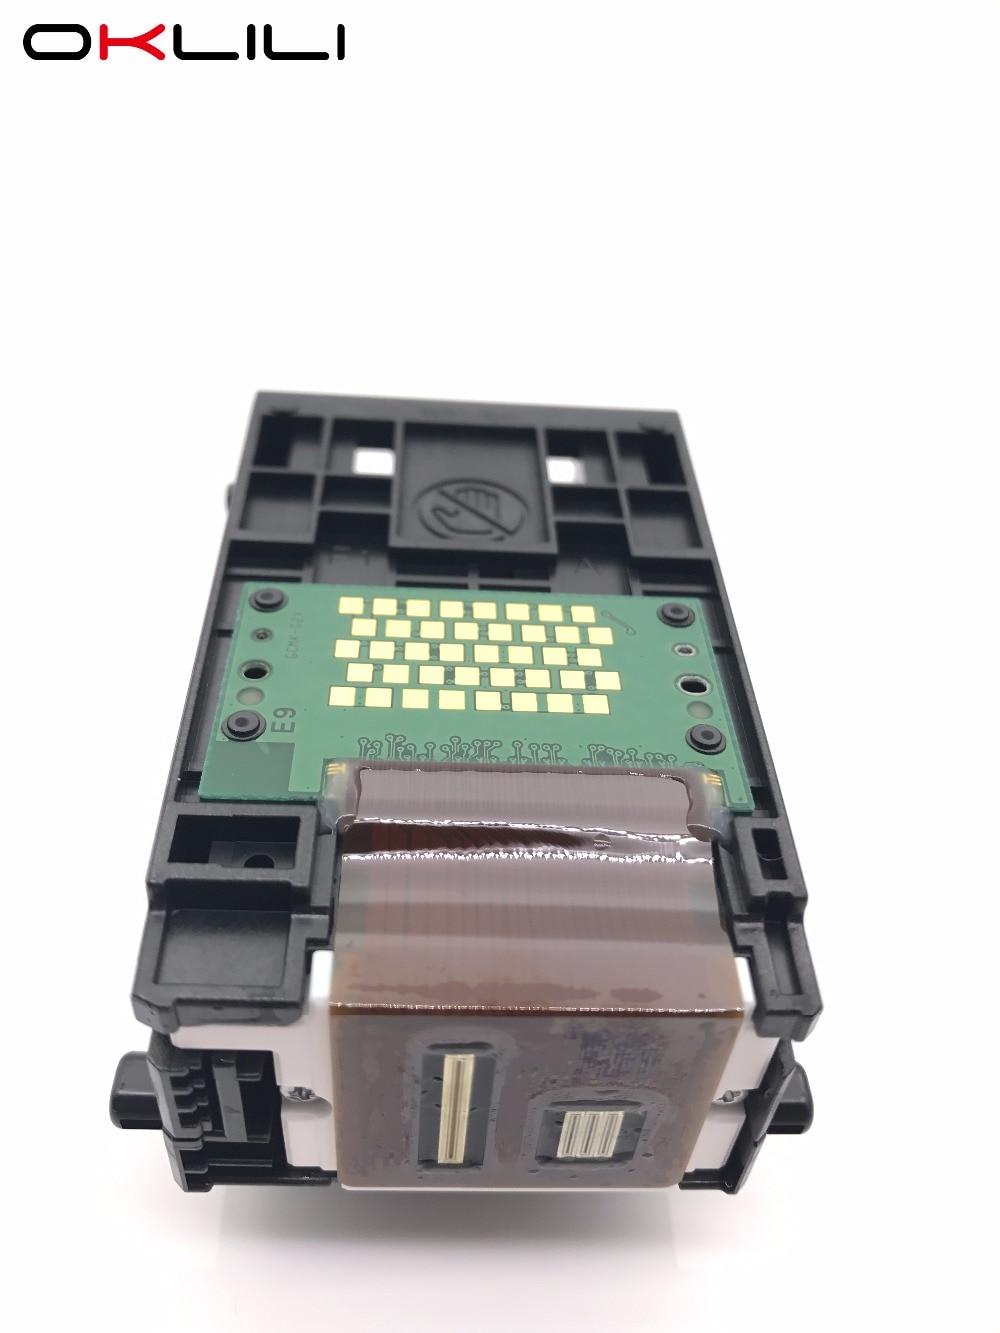 OKLILI NEW QY6-0054 QY6-0054-000 Printhead for Canon 450i 455i 470PD 475PD MP375R MP390 MP360 MP370 i450 i470D i475D iP2000